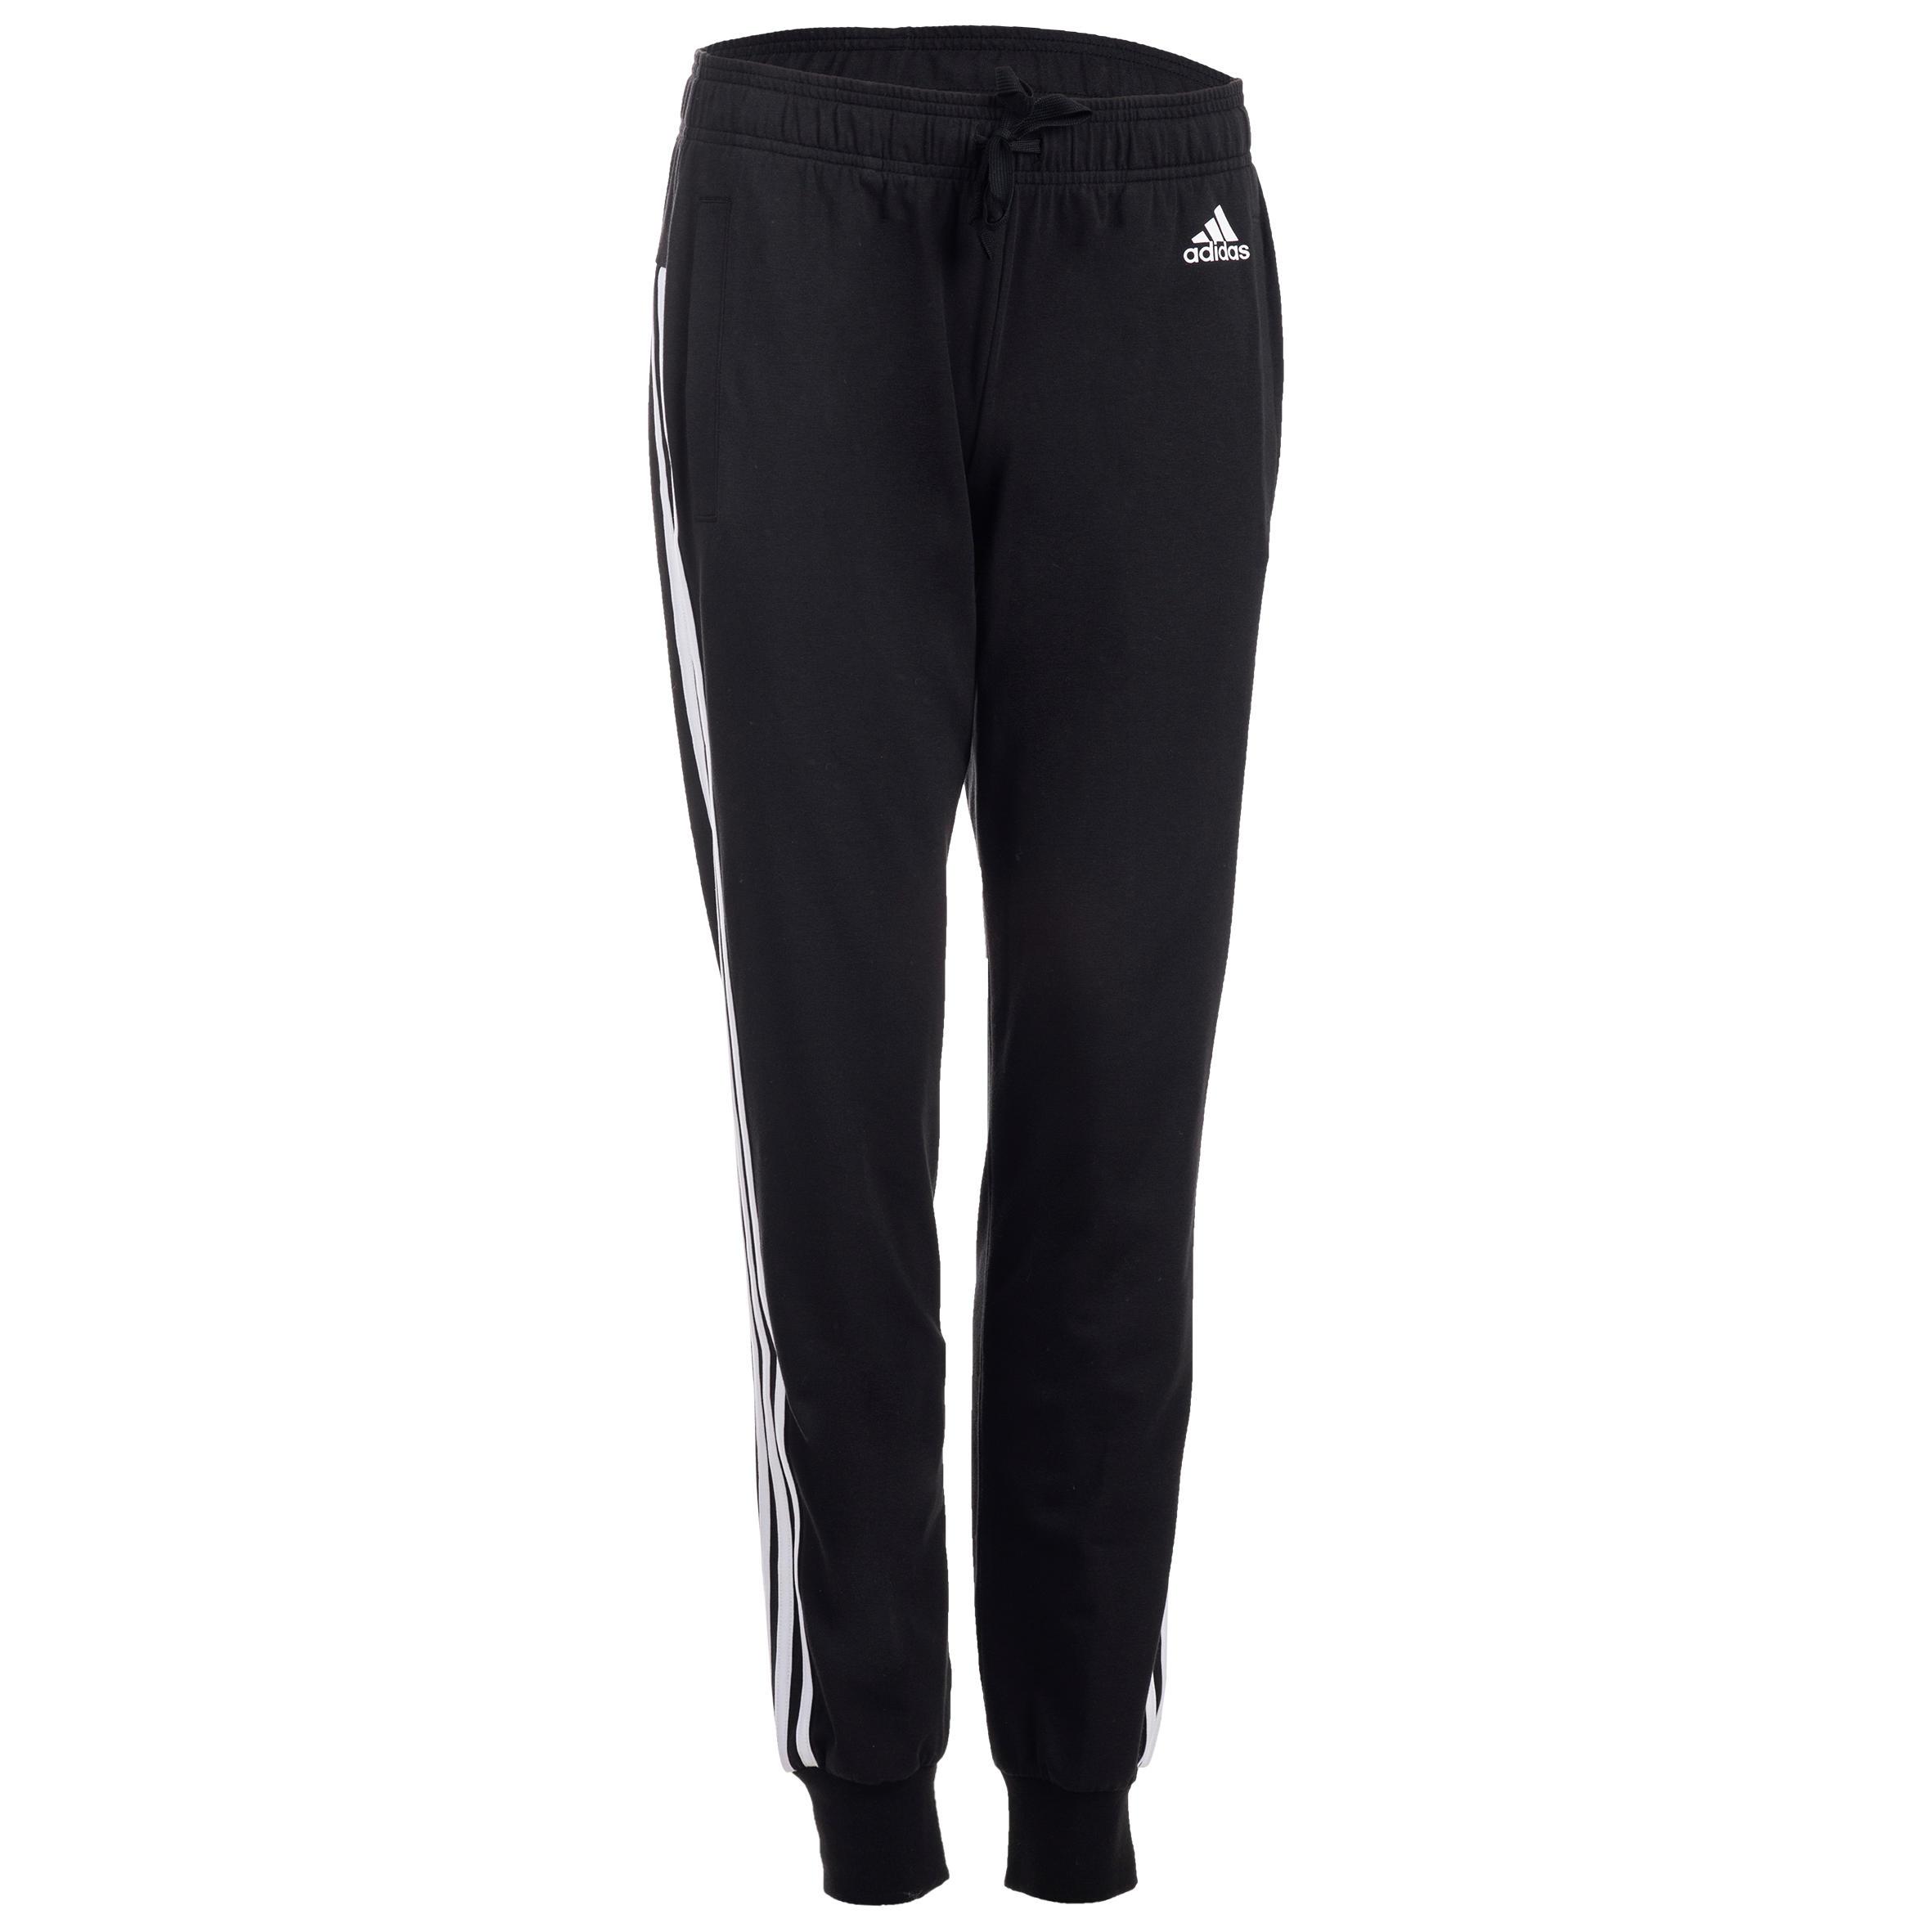 pantalon adidas femmes